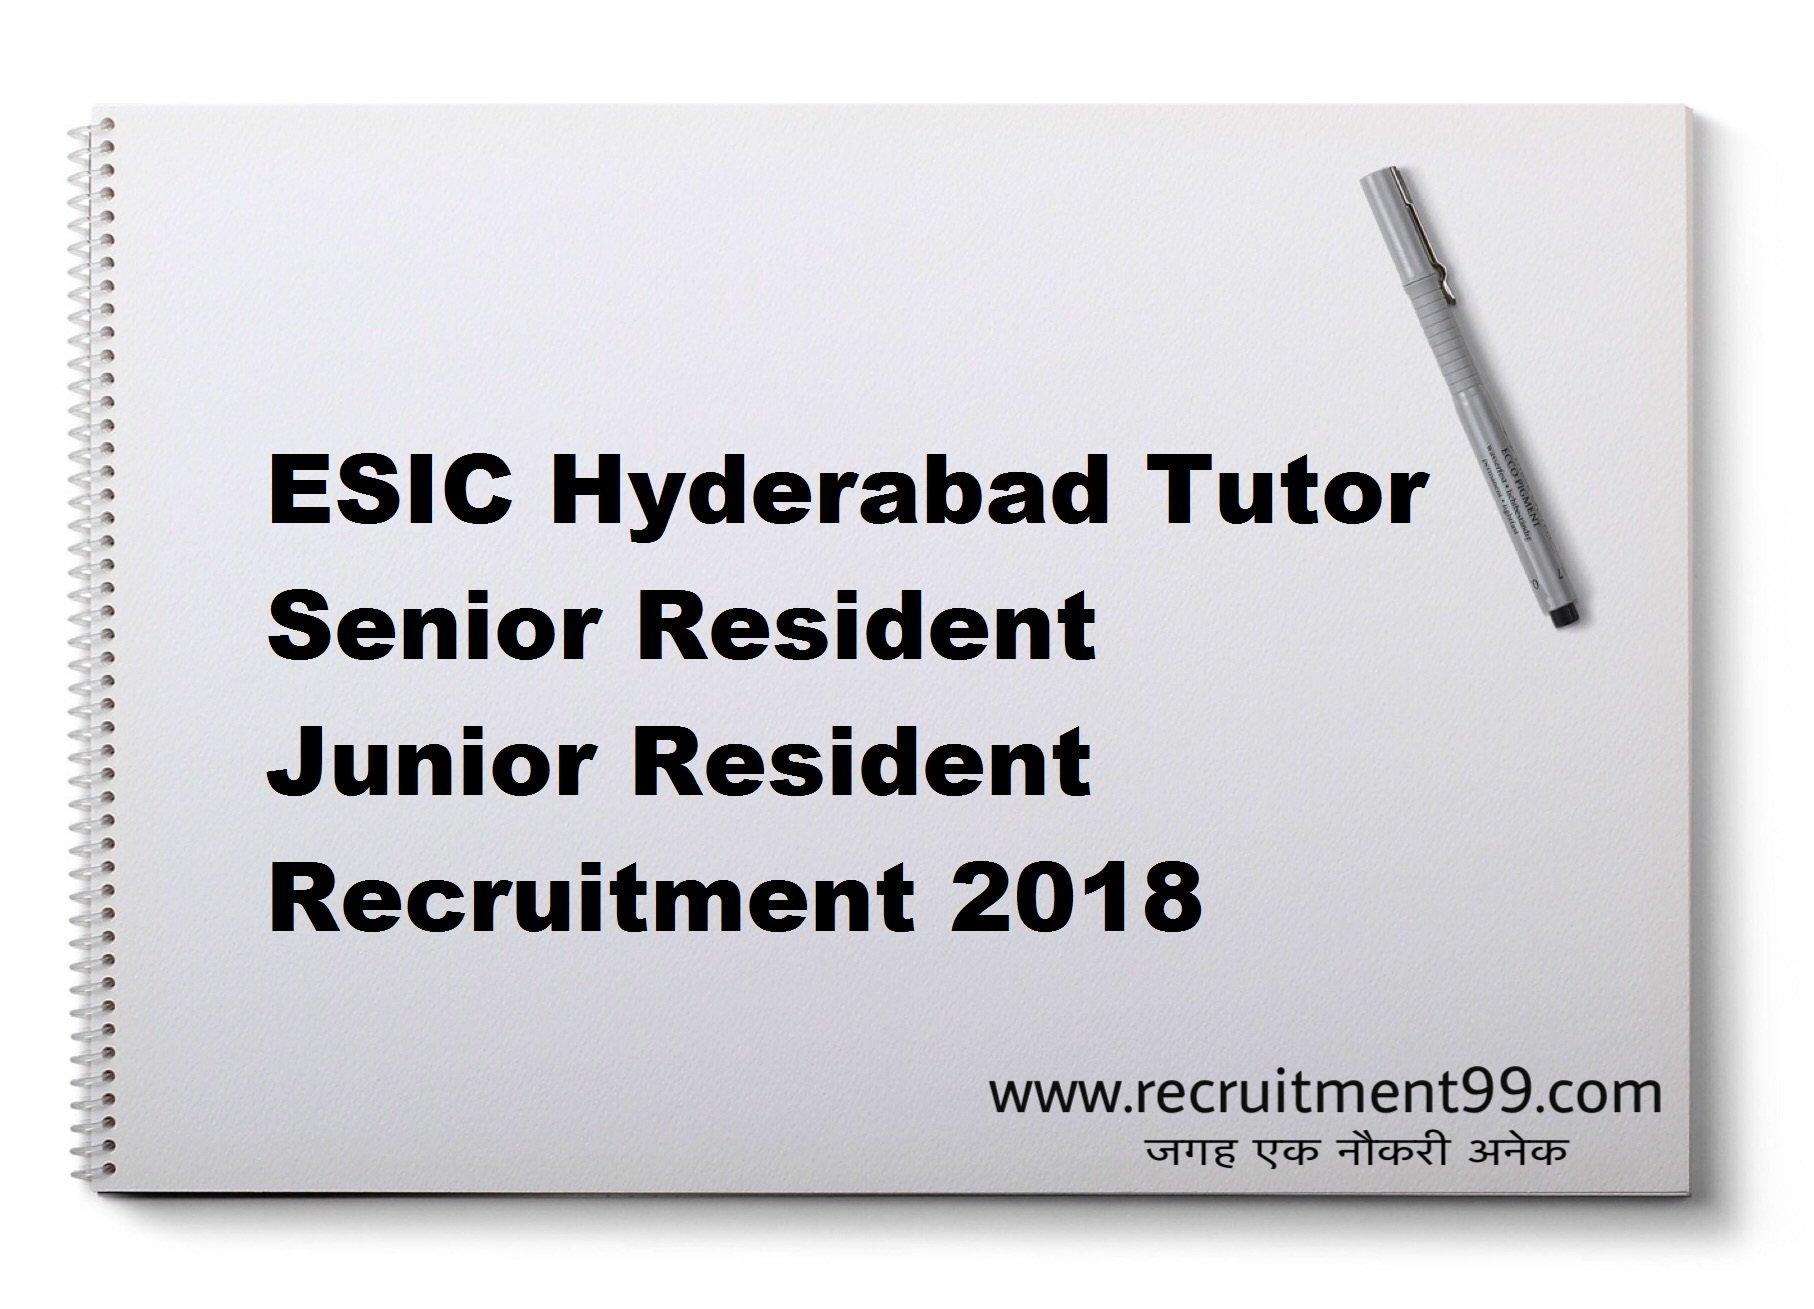 ESIC Hyderabad Tutor Senior Resident Junior Resident Recruitment Admit Card Result 2018